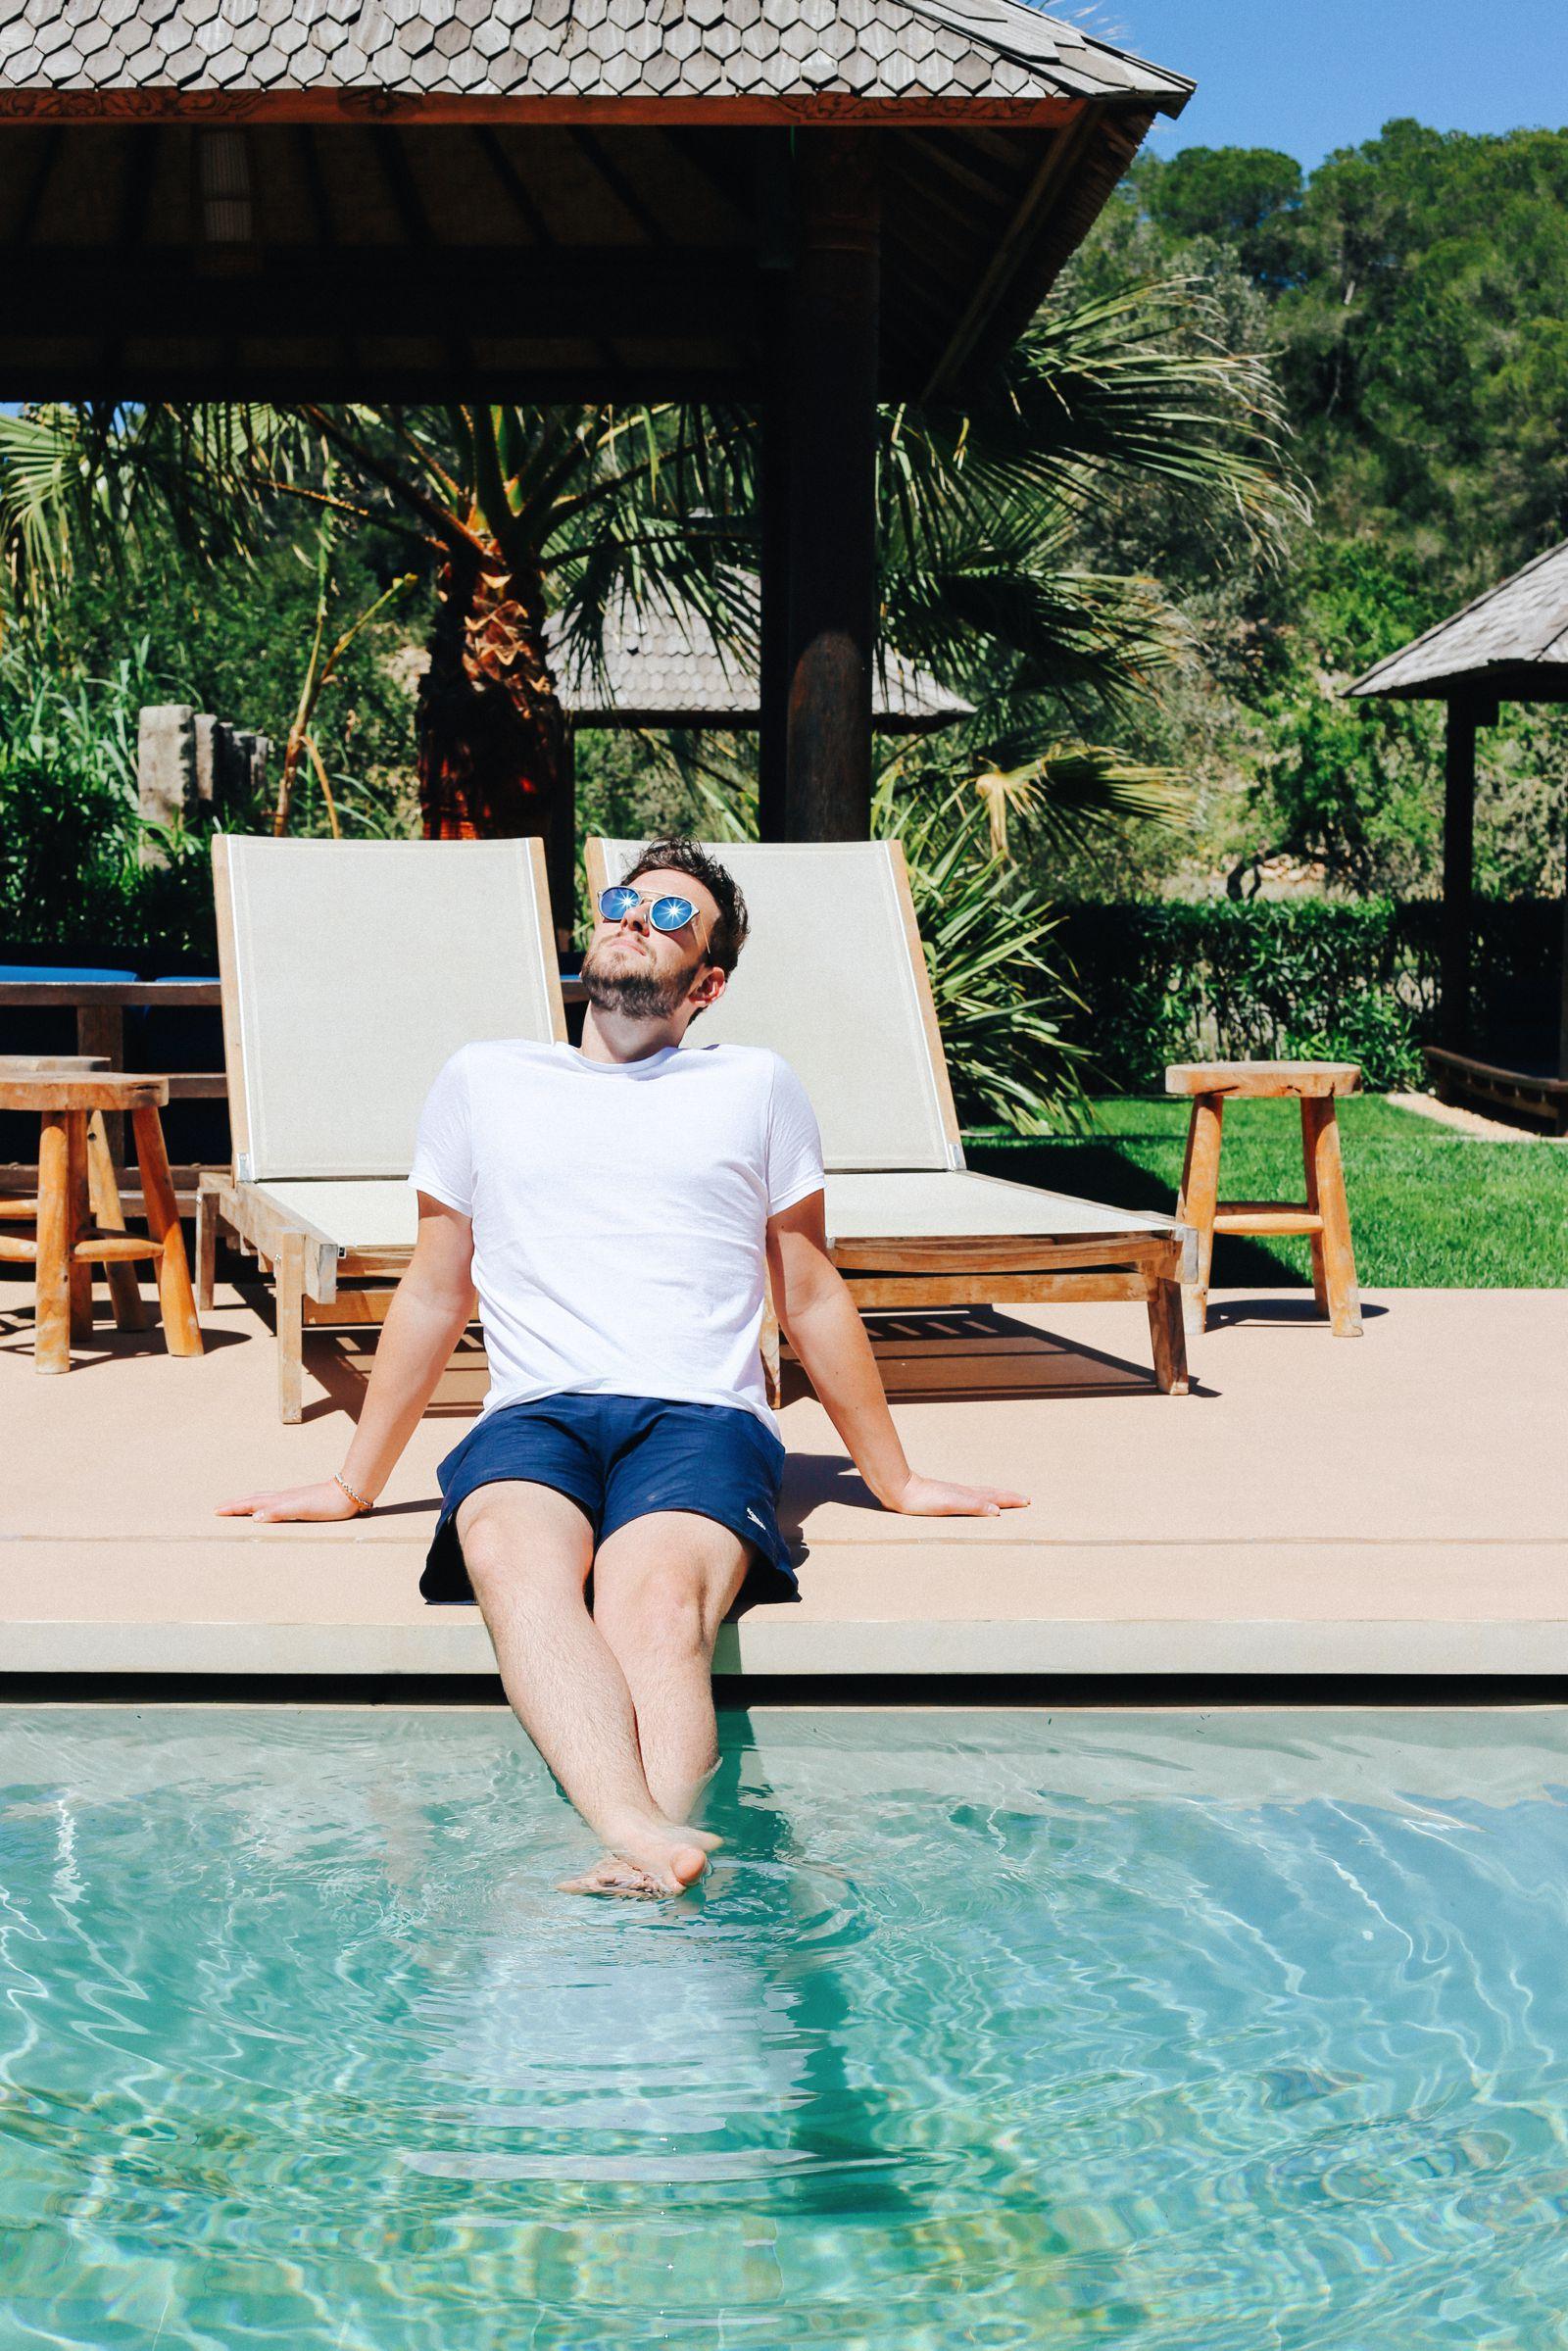 Ibiza Summer Fun In The Sun with Kapten & Sons (10)